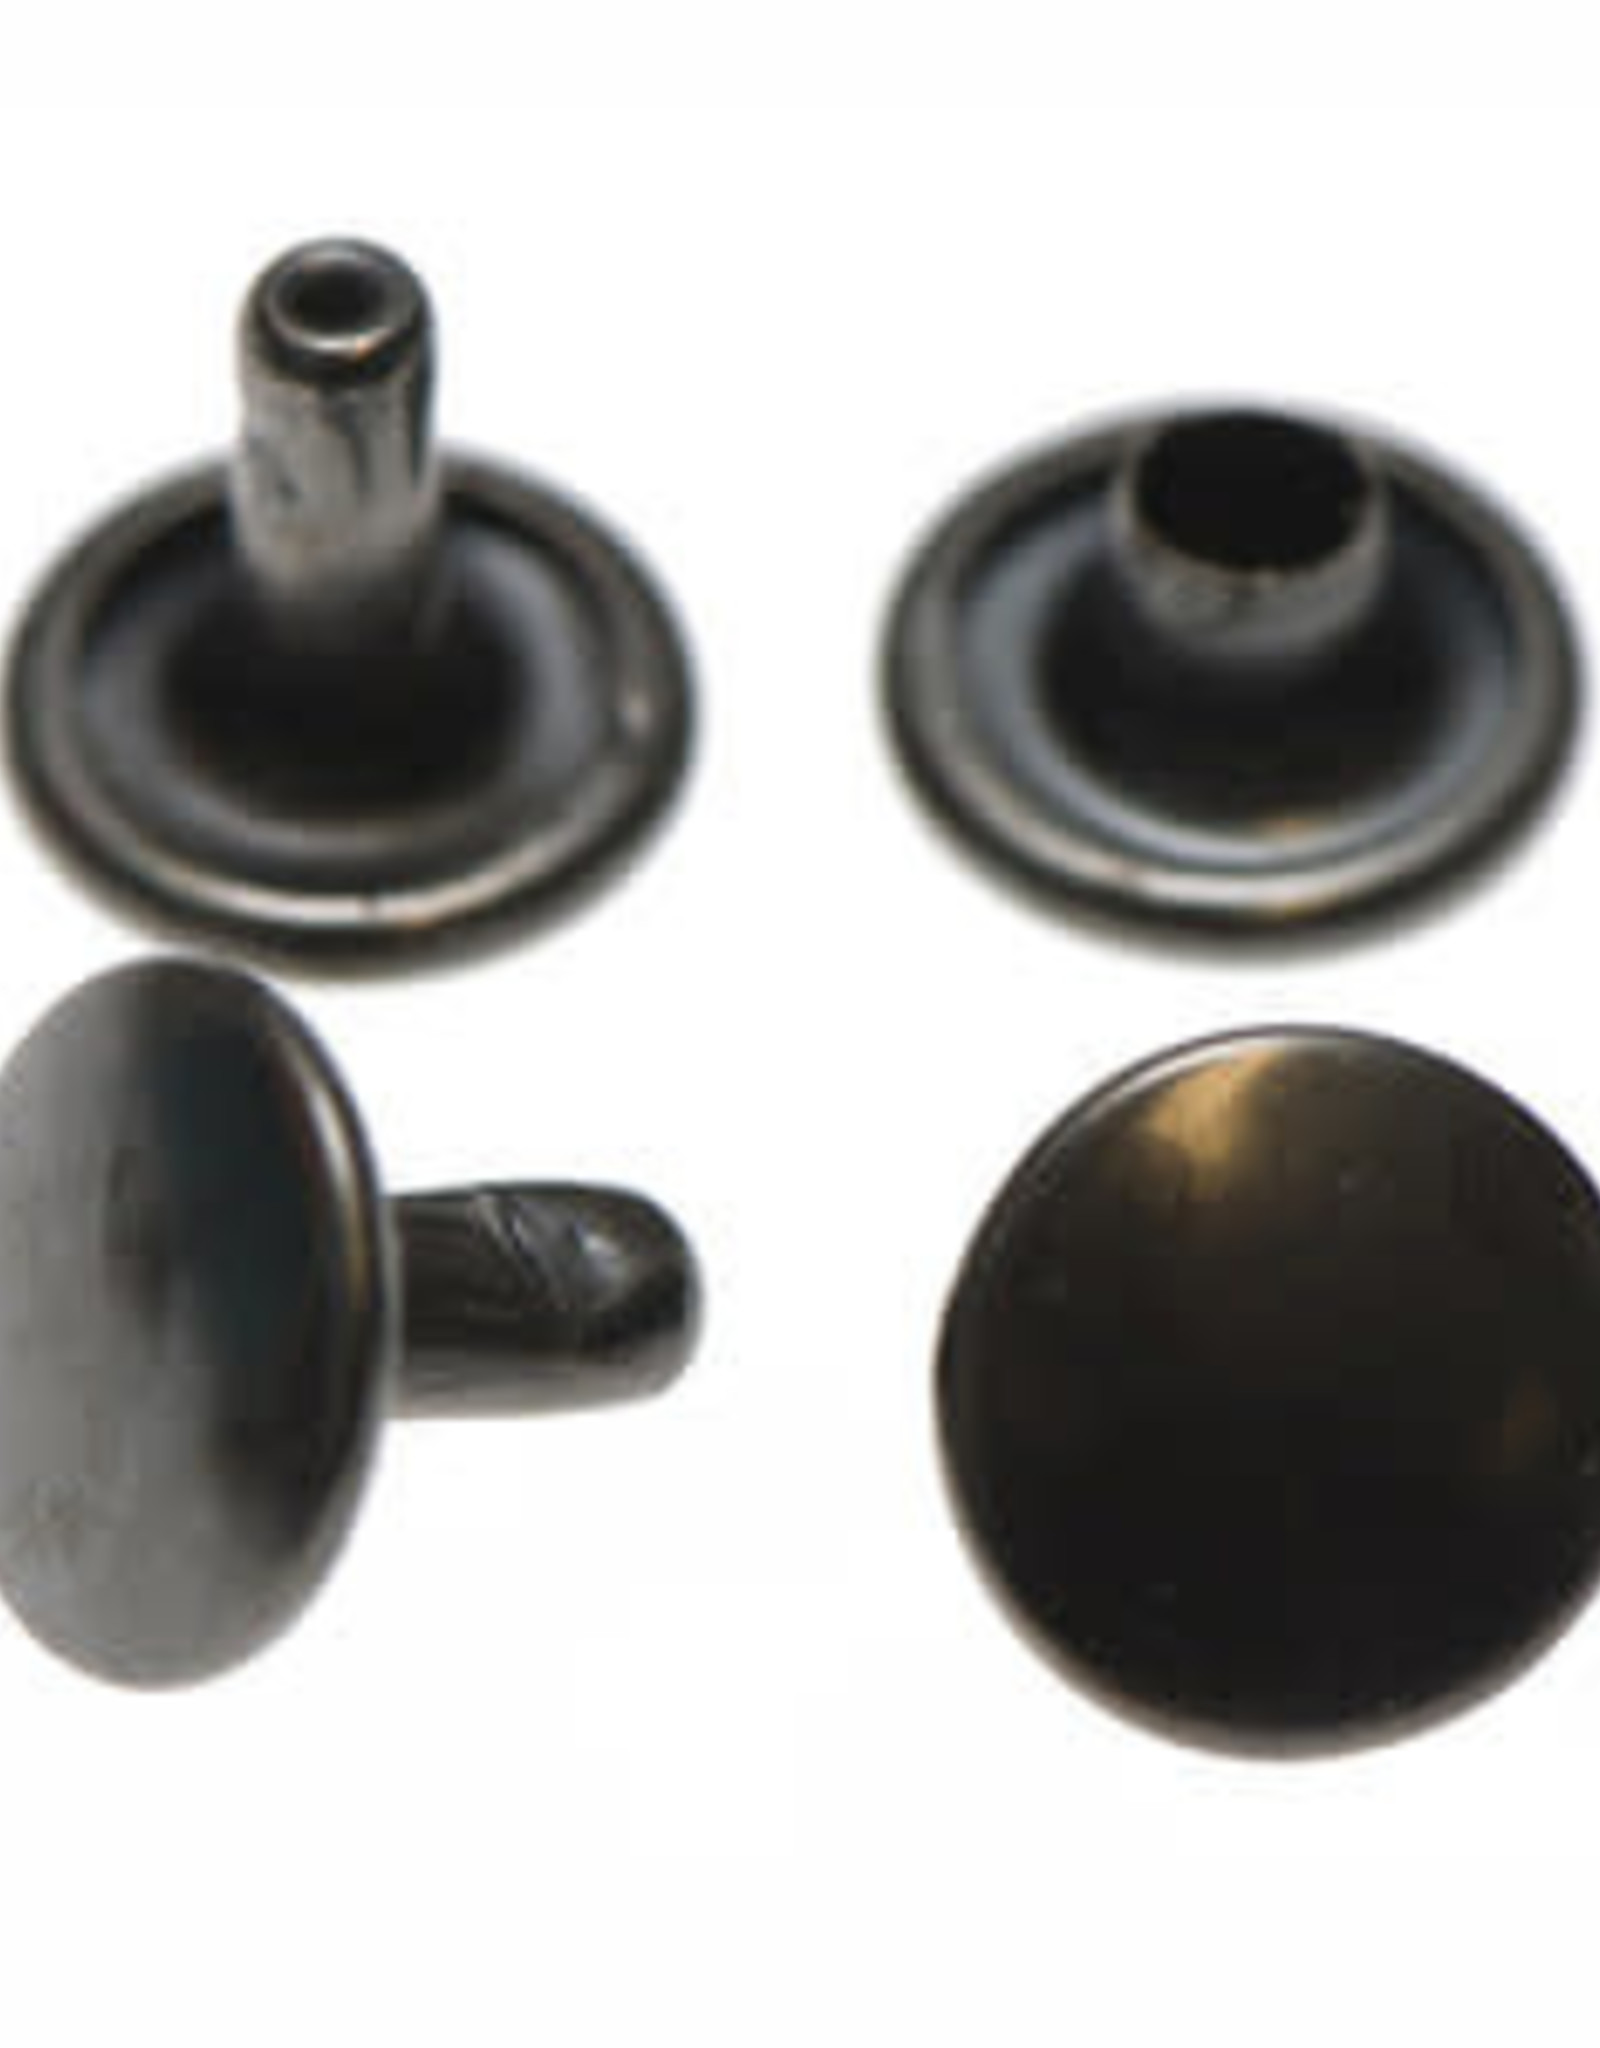 Holnieten 9mm - Gunmetal - 10 stuks - DUBBELE KOP